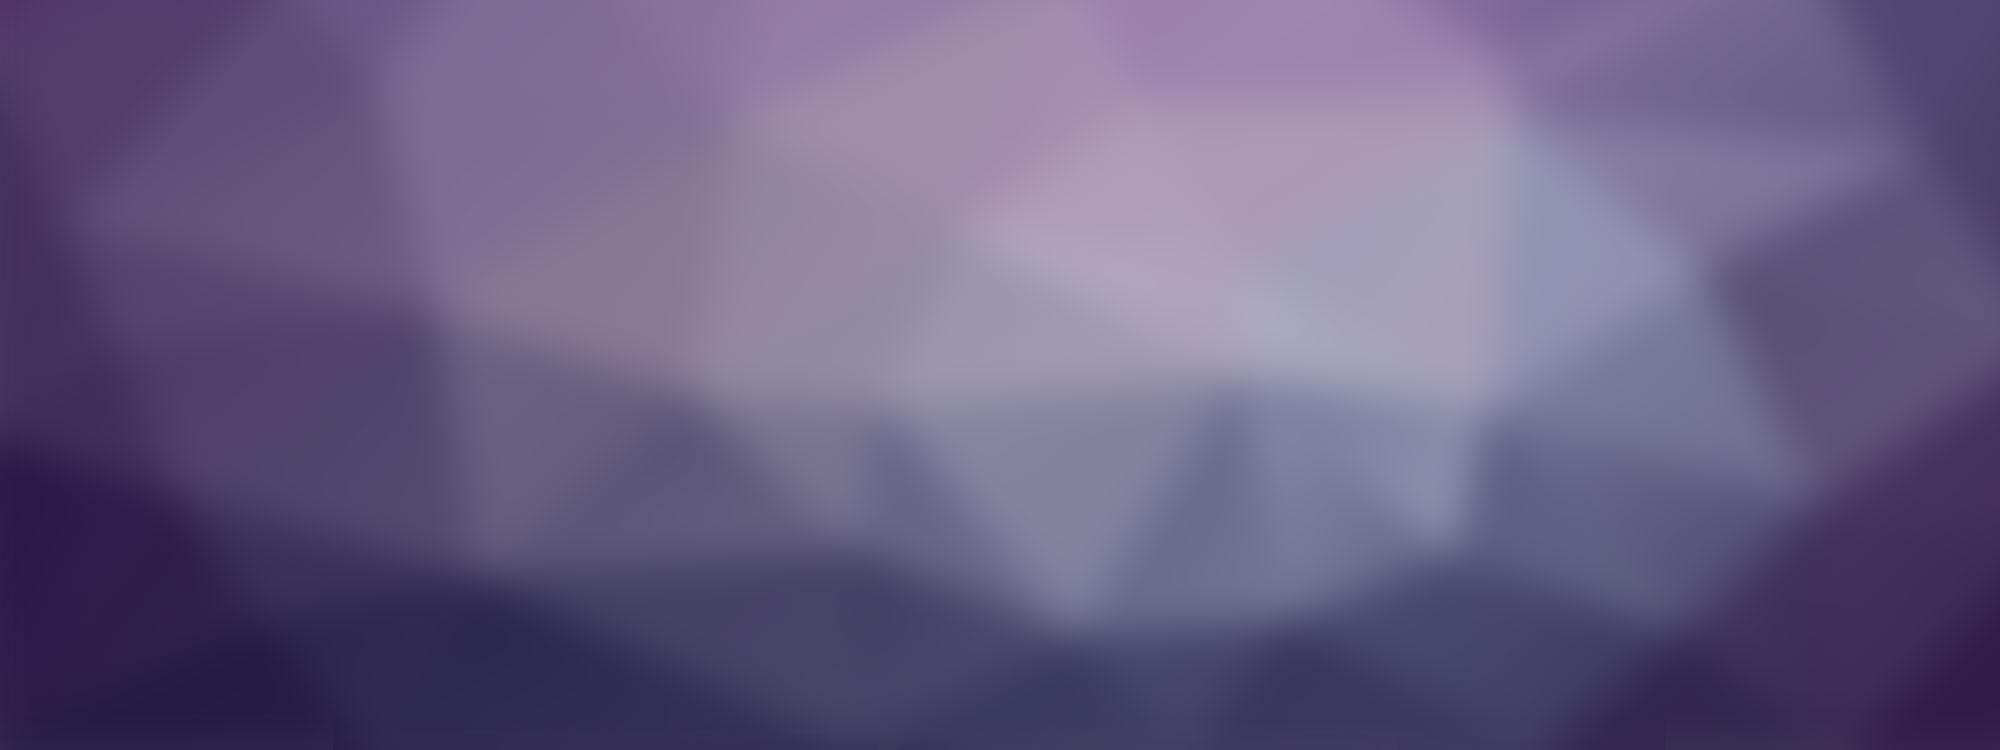 Blur_Background_November_2017_01